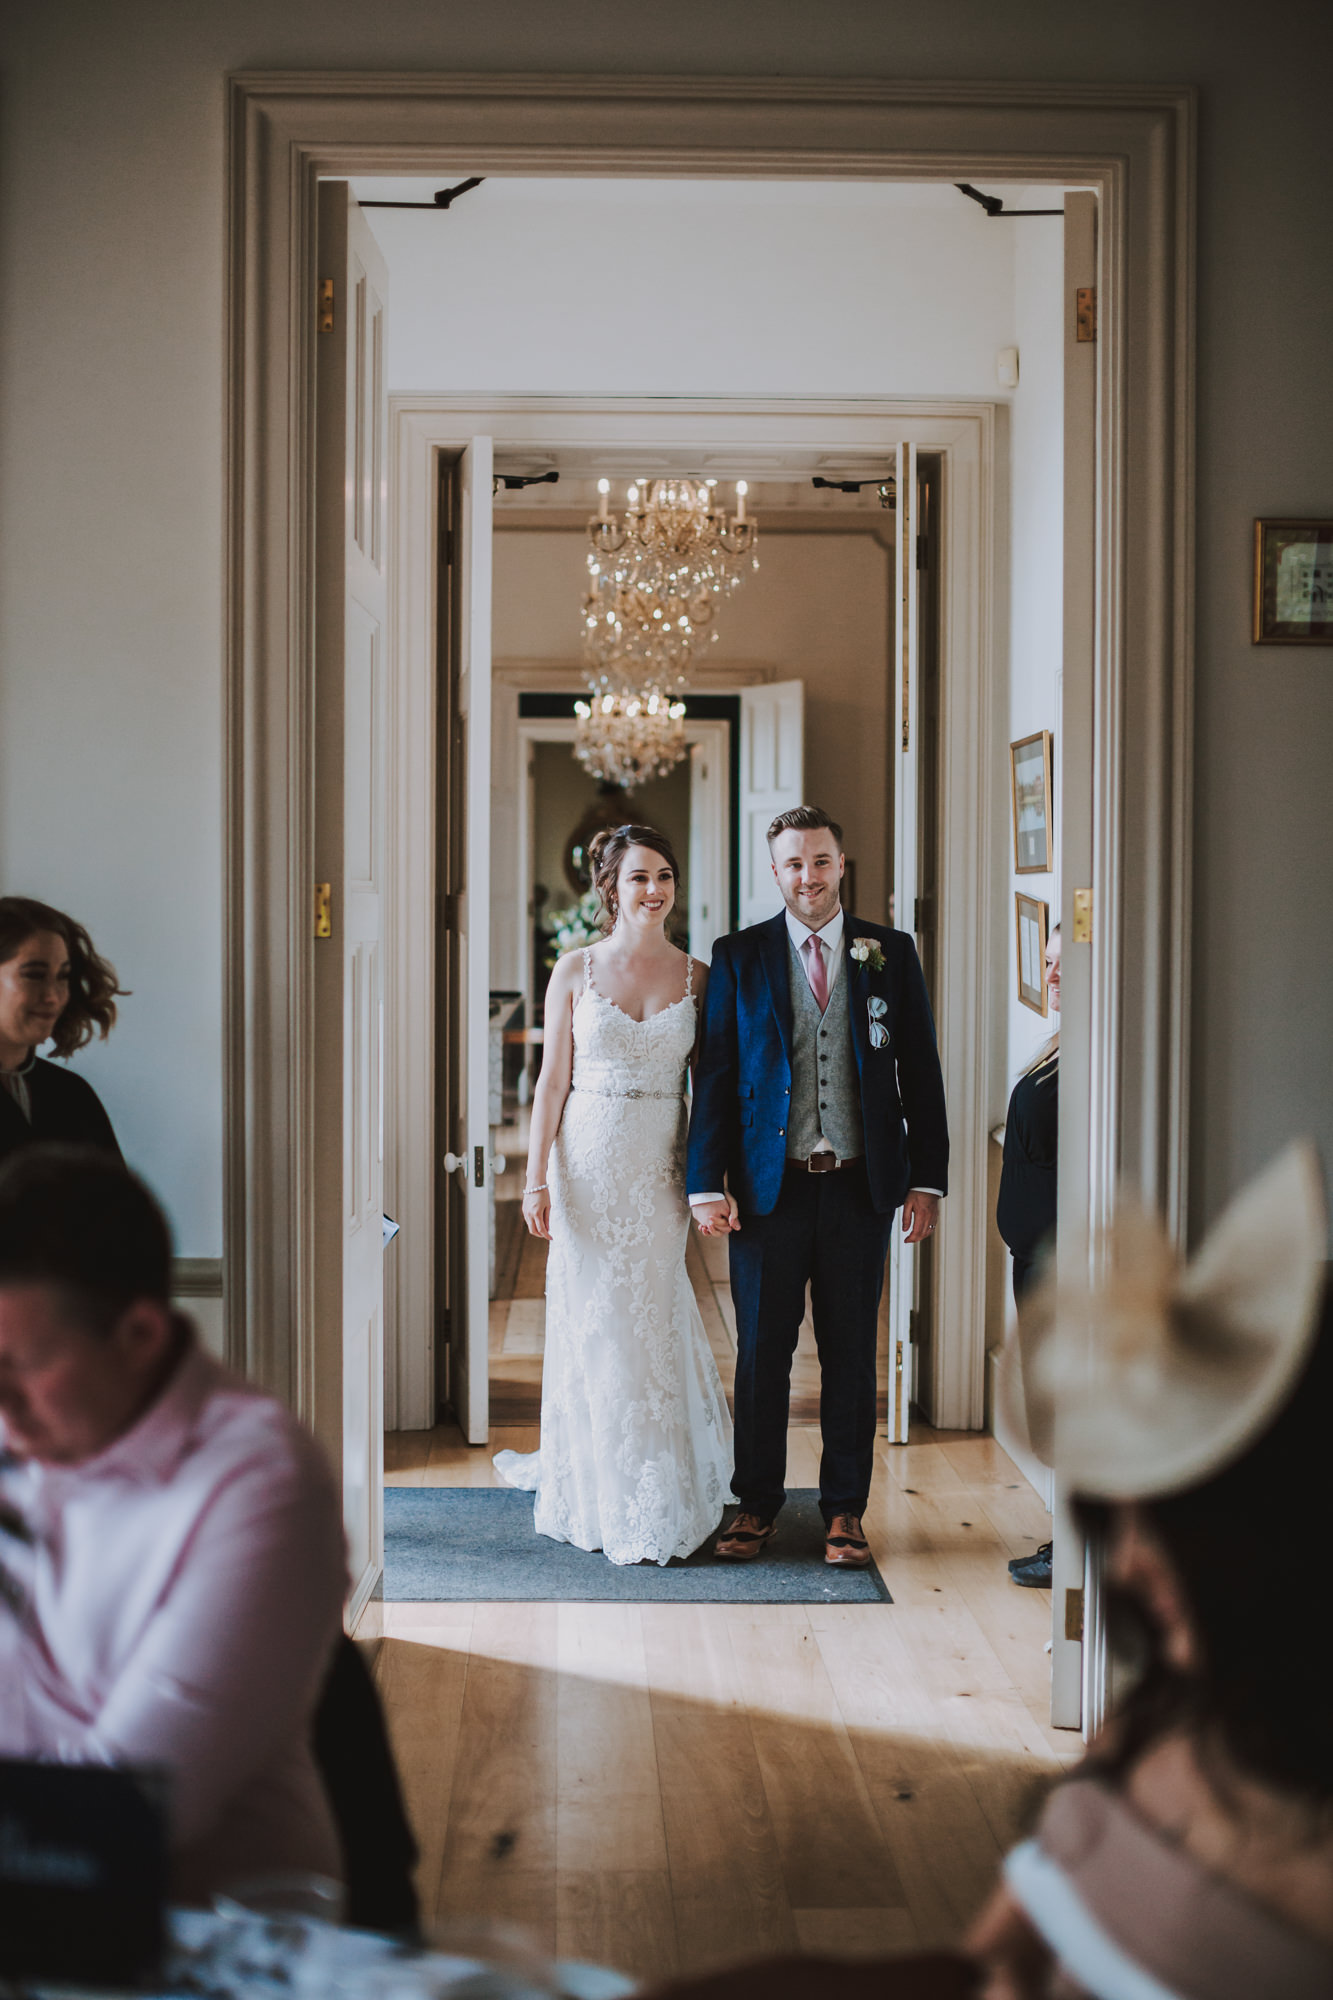 hodsock priory wedding photographers blog73.jpg